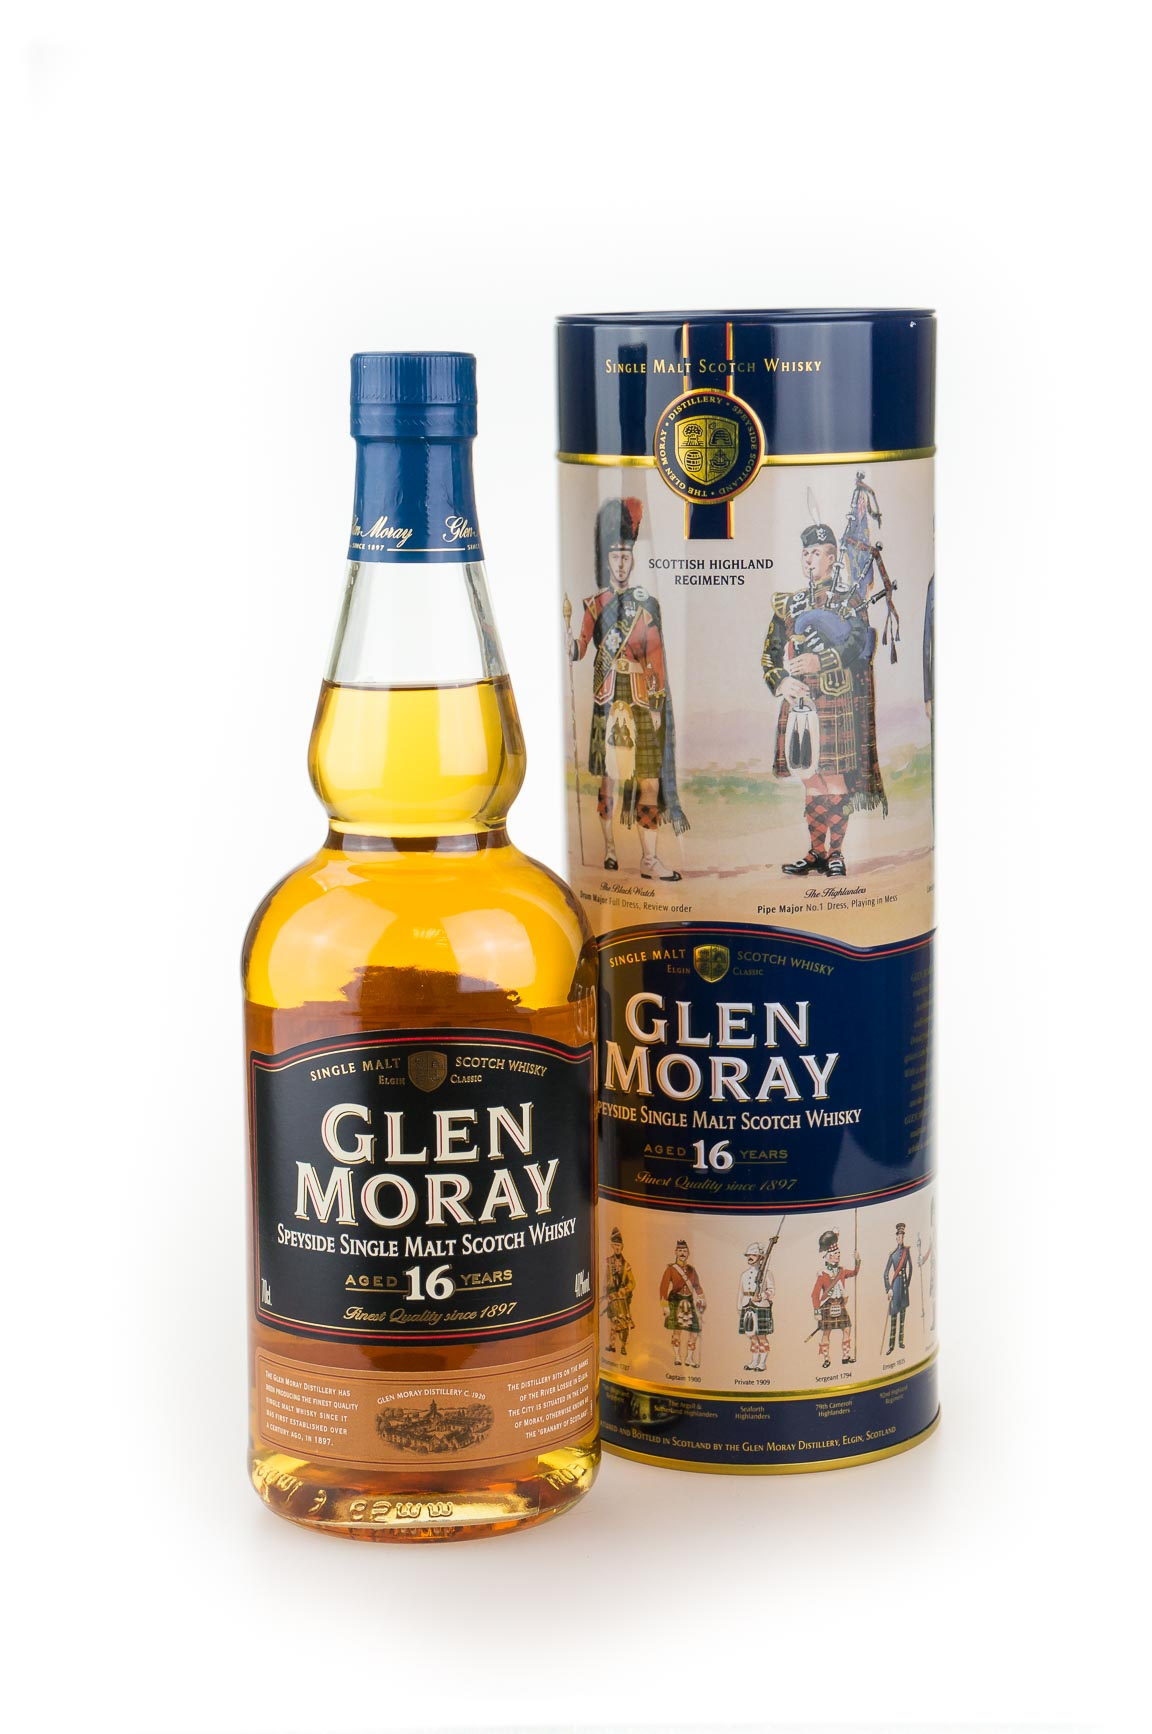 glen moray 16 jahre single malt scotch whisky kaufen ab 47 67 eur im single malt scotch whisky. Black Bedroom Furniture Sets. Home Design Ideas